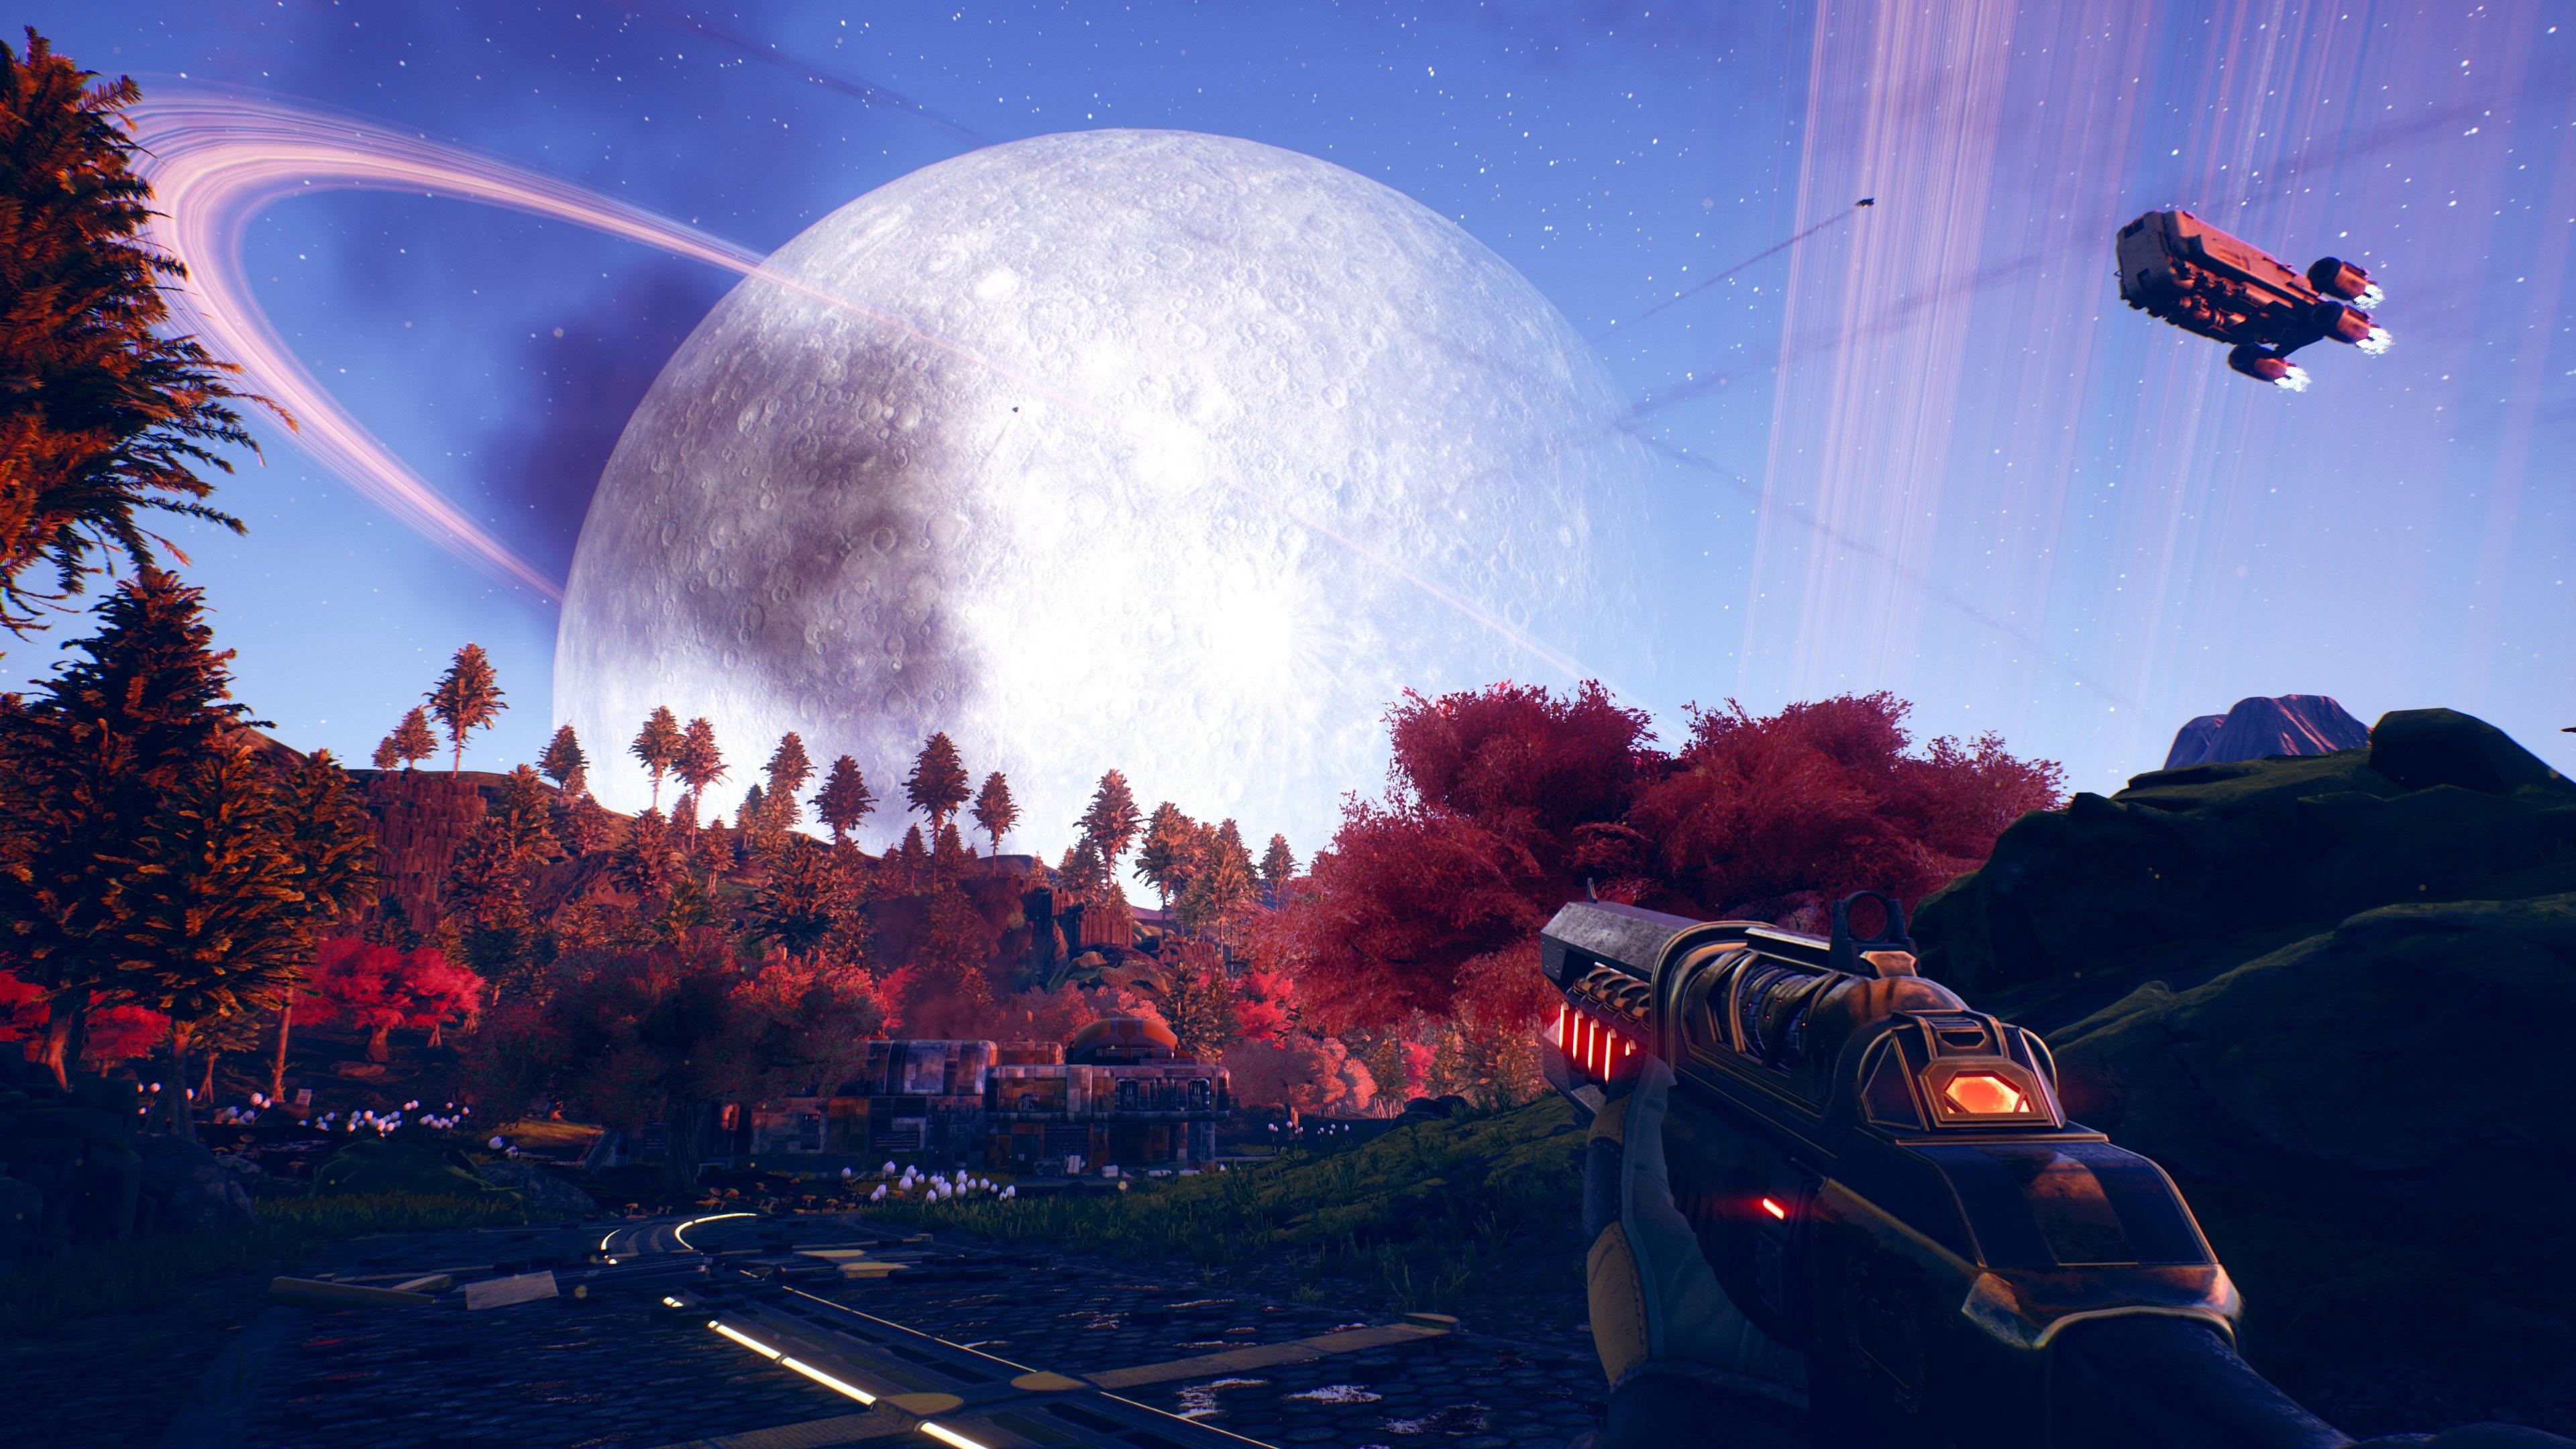 Mass Effect Fall Wallpaper The Outer Worlds Wallpapers In Ultra Hd 4k Gameranx